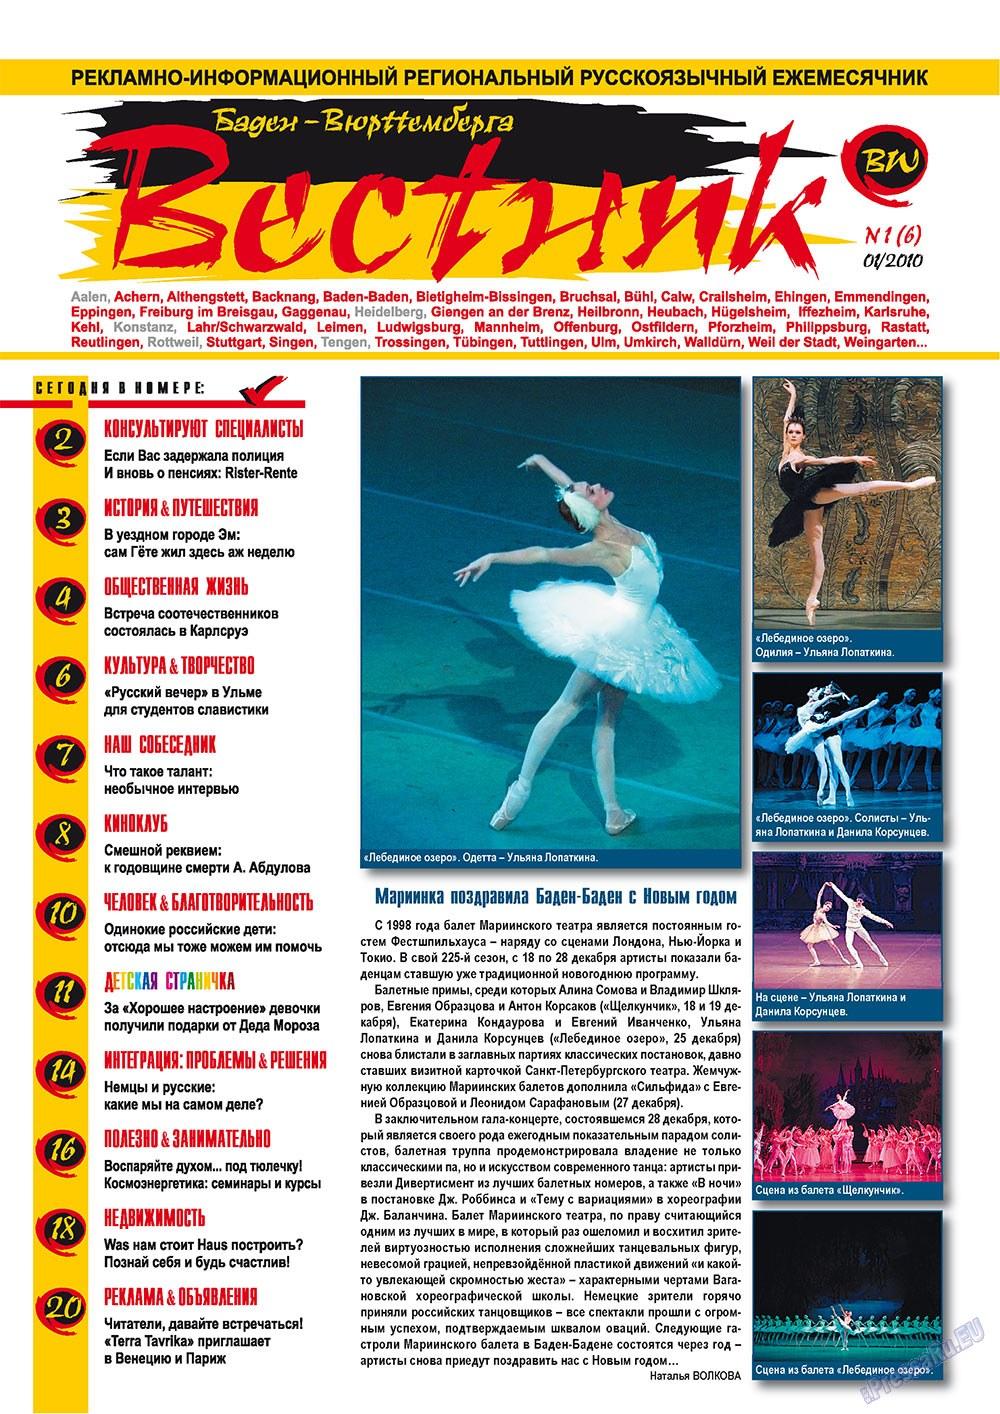 Вестник-info (журнал). 2010 год, номер 1, стр. 1